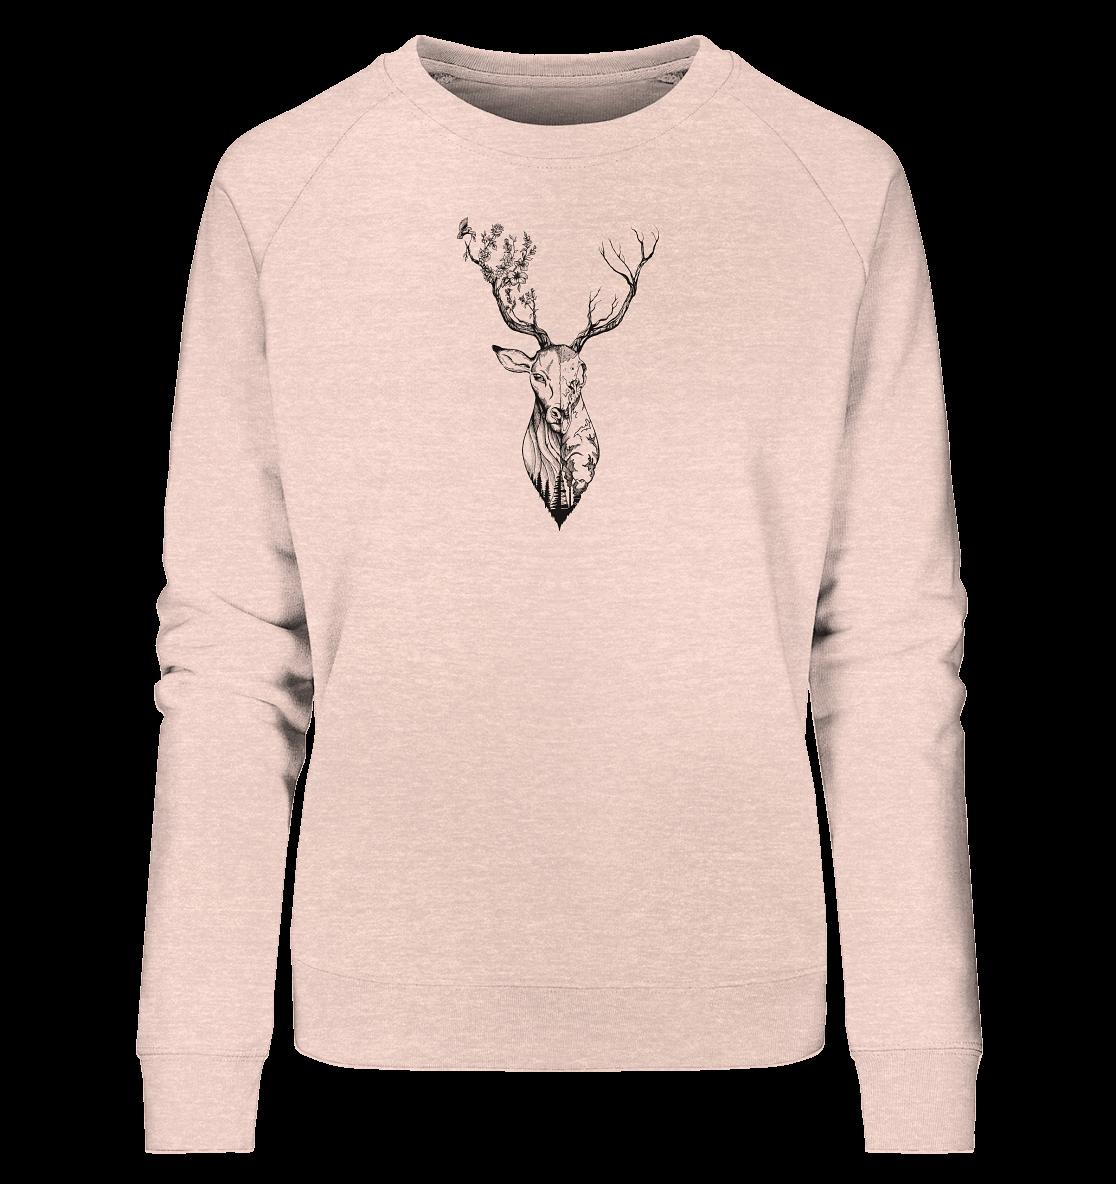 front-ladies-organic-sweatshirt-ffded6-1116x-8.png